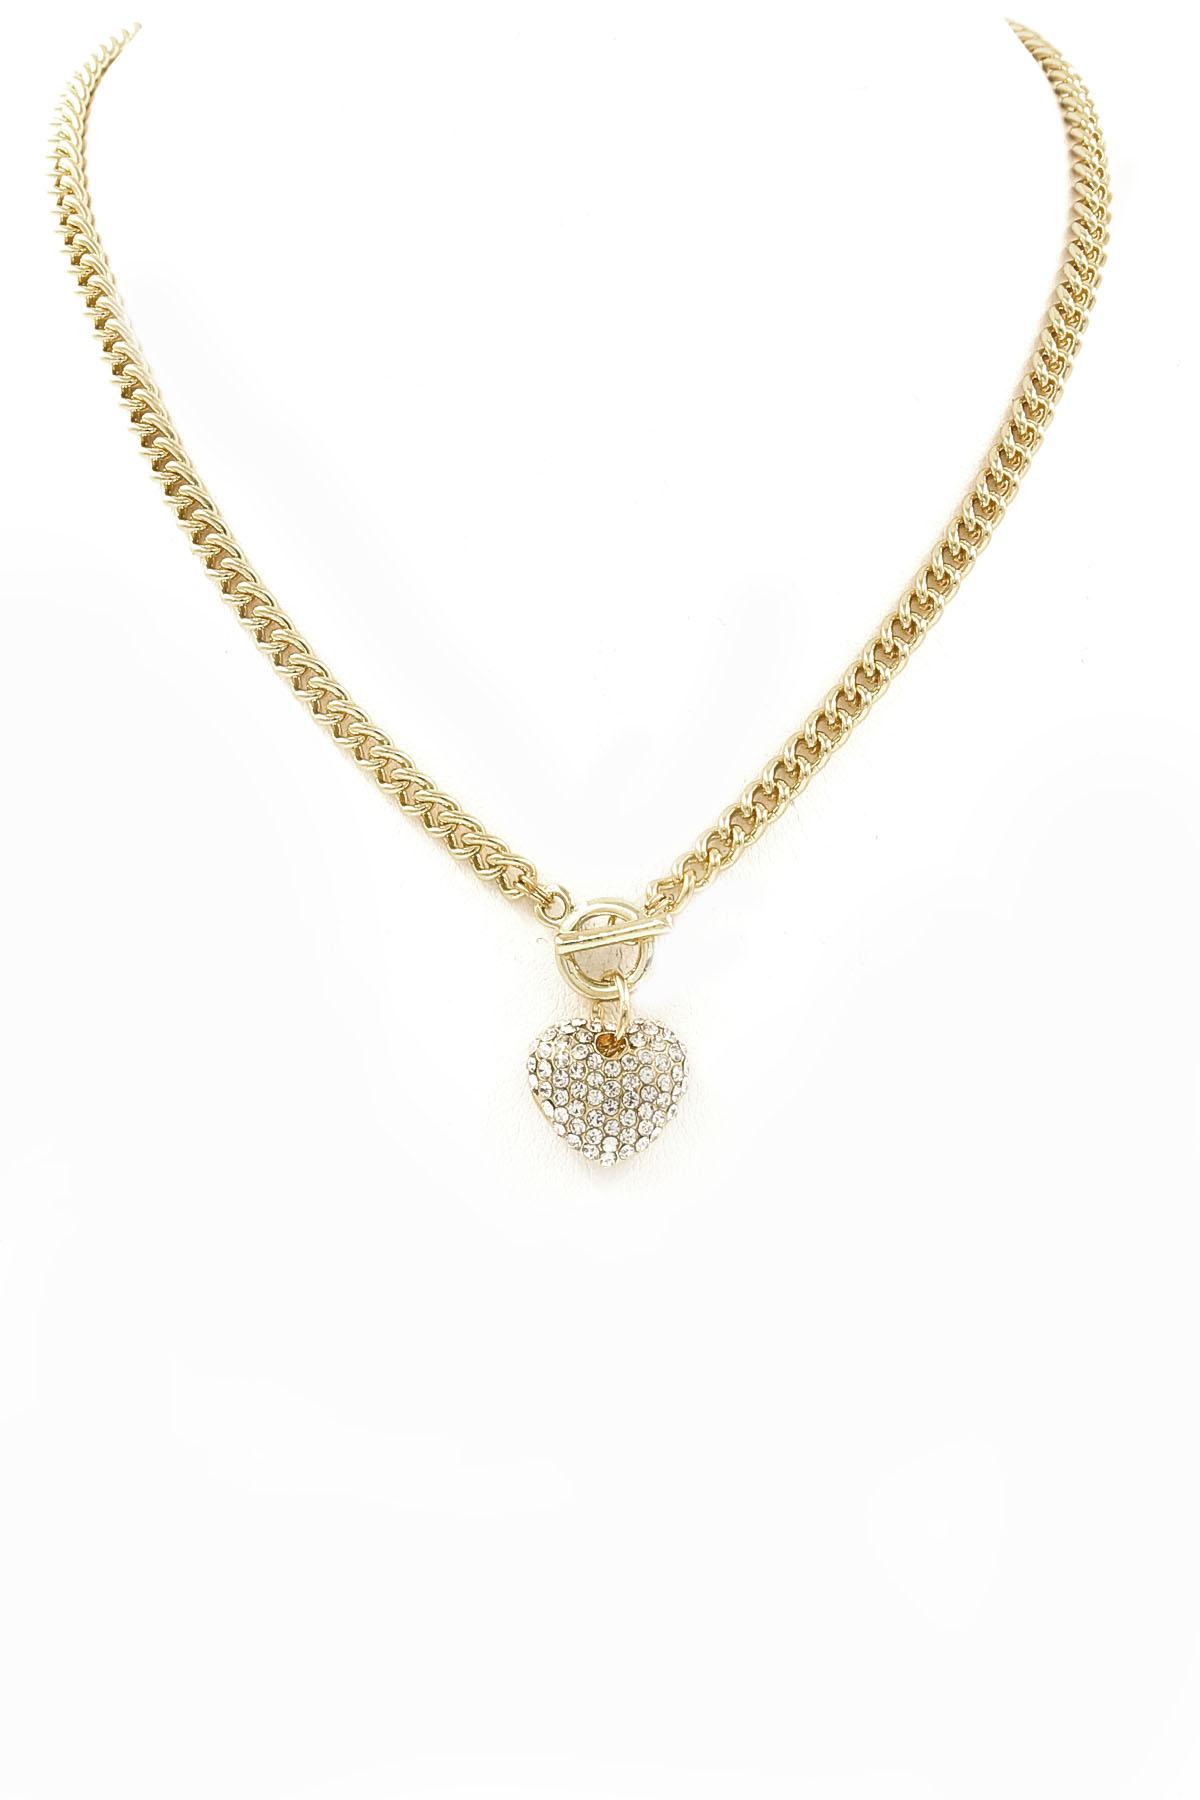 Www Hear Cut Com : Rhinestone/Hear Cut Out Pendant Toggle Necklace - Necklaces